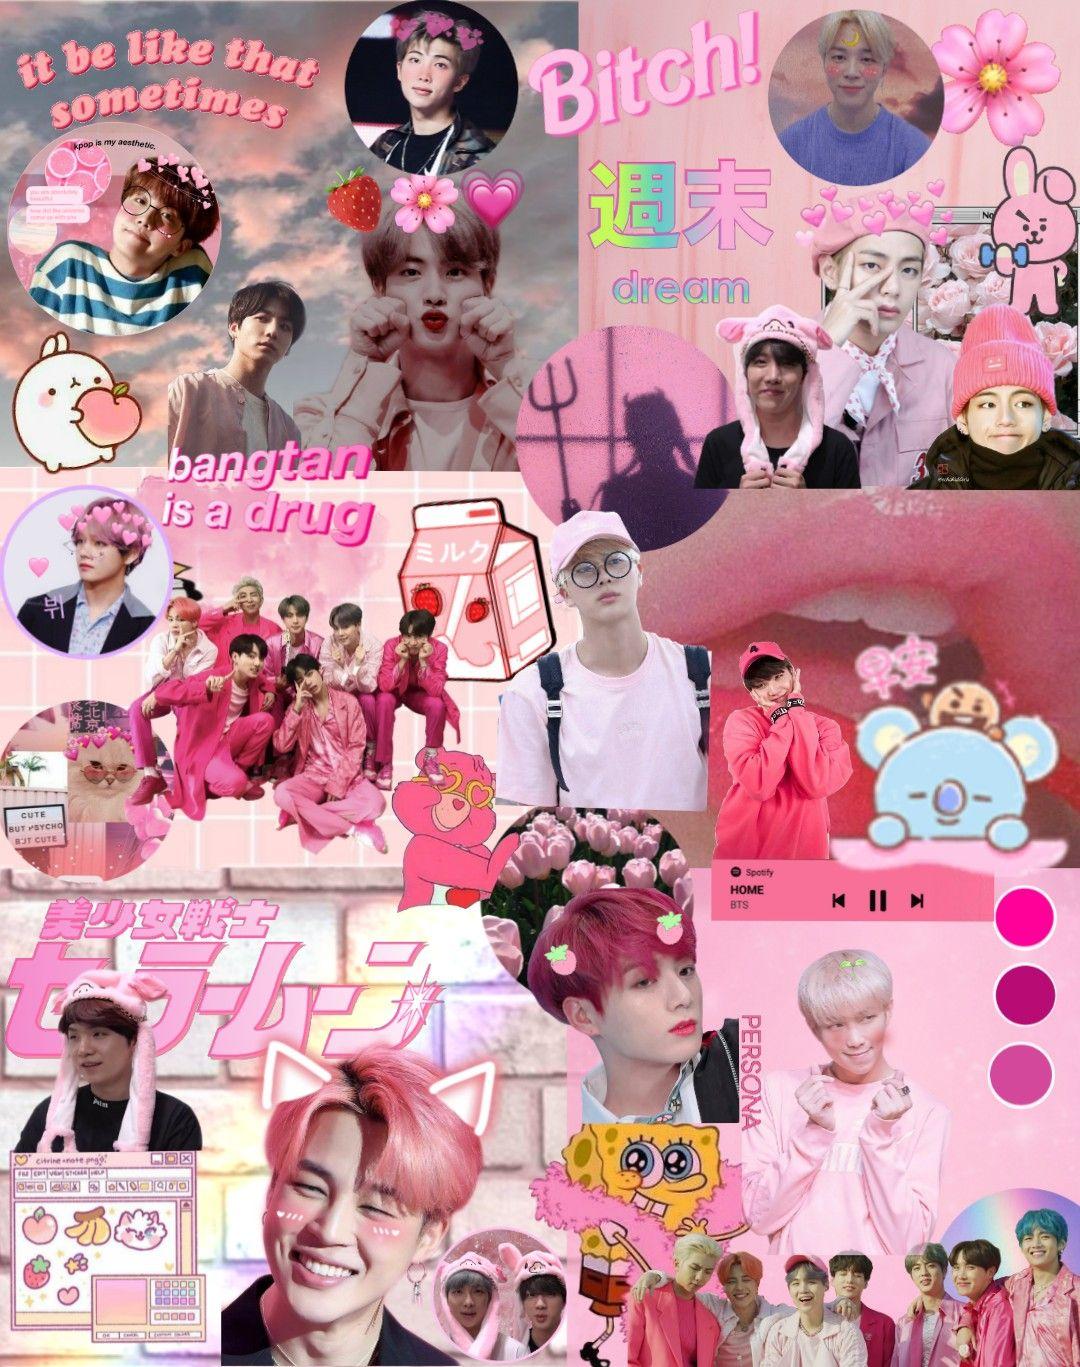 Freetoedit Bts Btsedit Aesthetic Wallpaper Aestheticwallpaper Btsaesthetic Bt21 Pi Phone Wallpaper Pink Pink Wallpaper Desktop Pretty Wallpaper Iphone Bts pink aesthetic wallpaper desktop